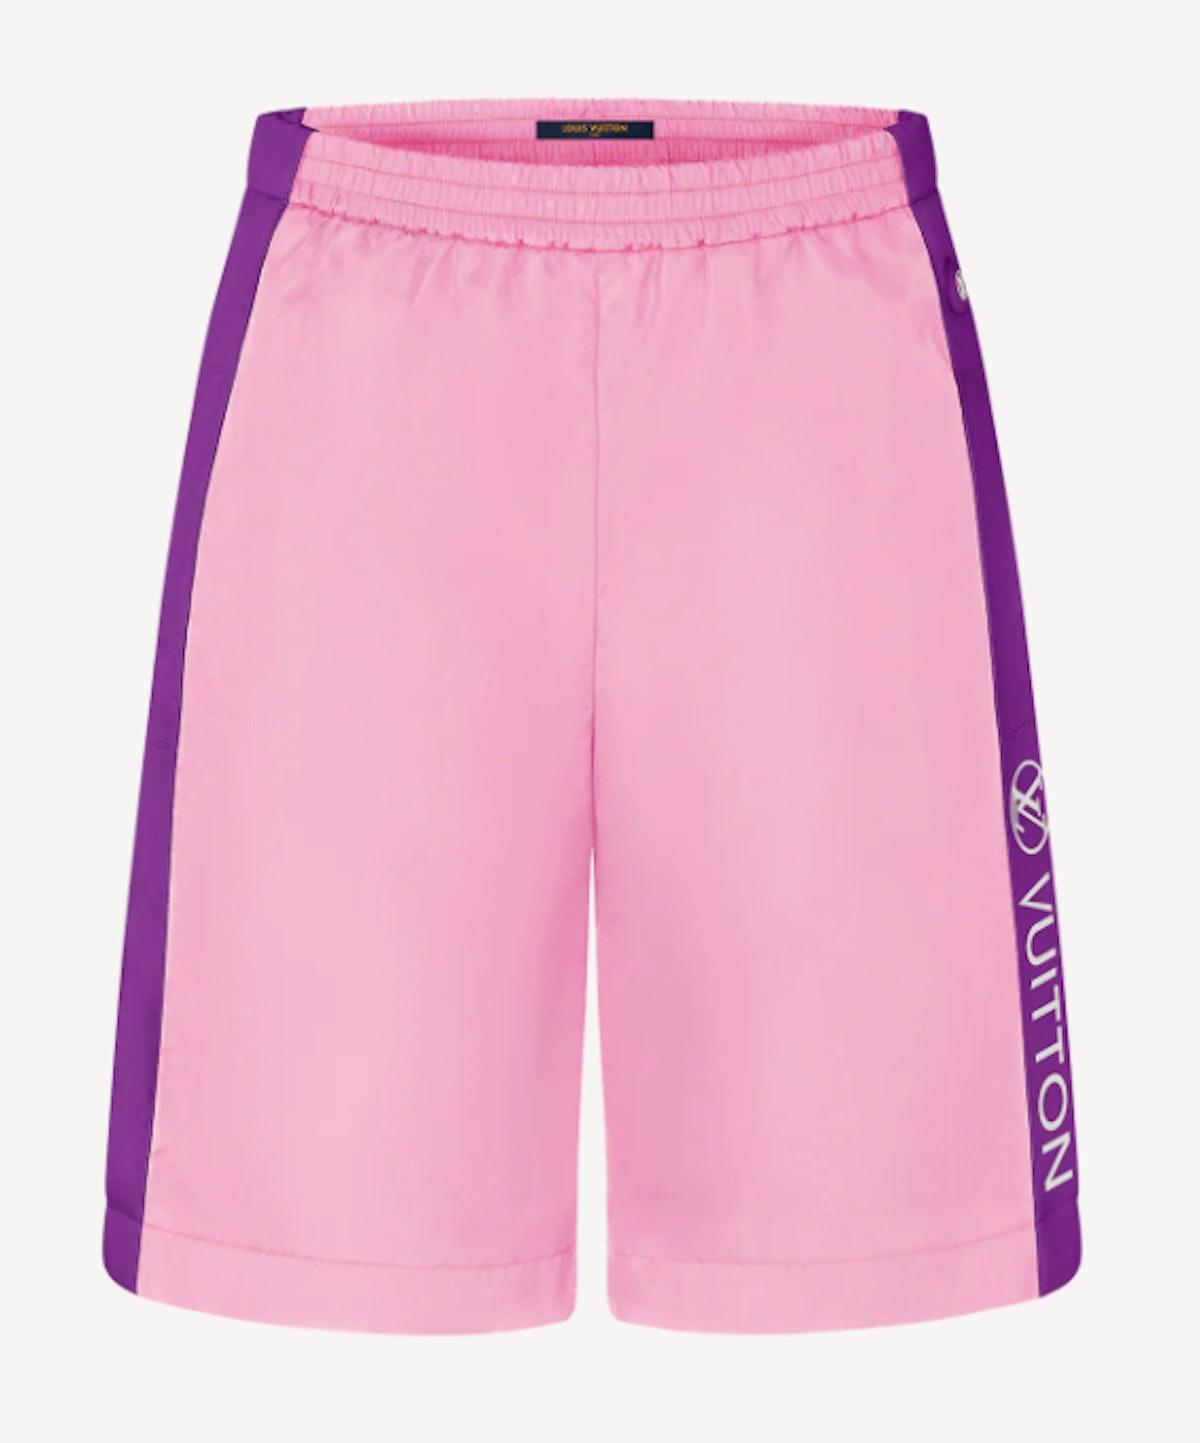 Vuittamins Bermuda Shorts